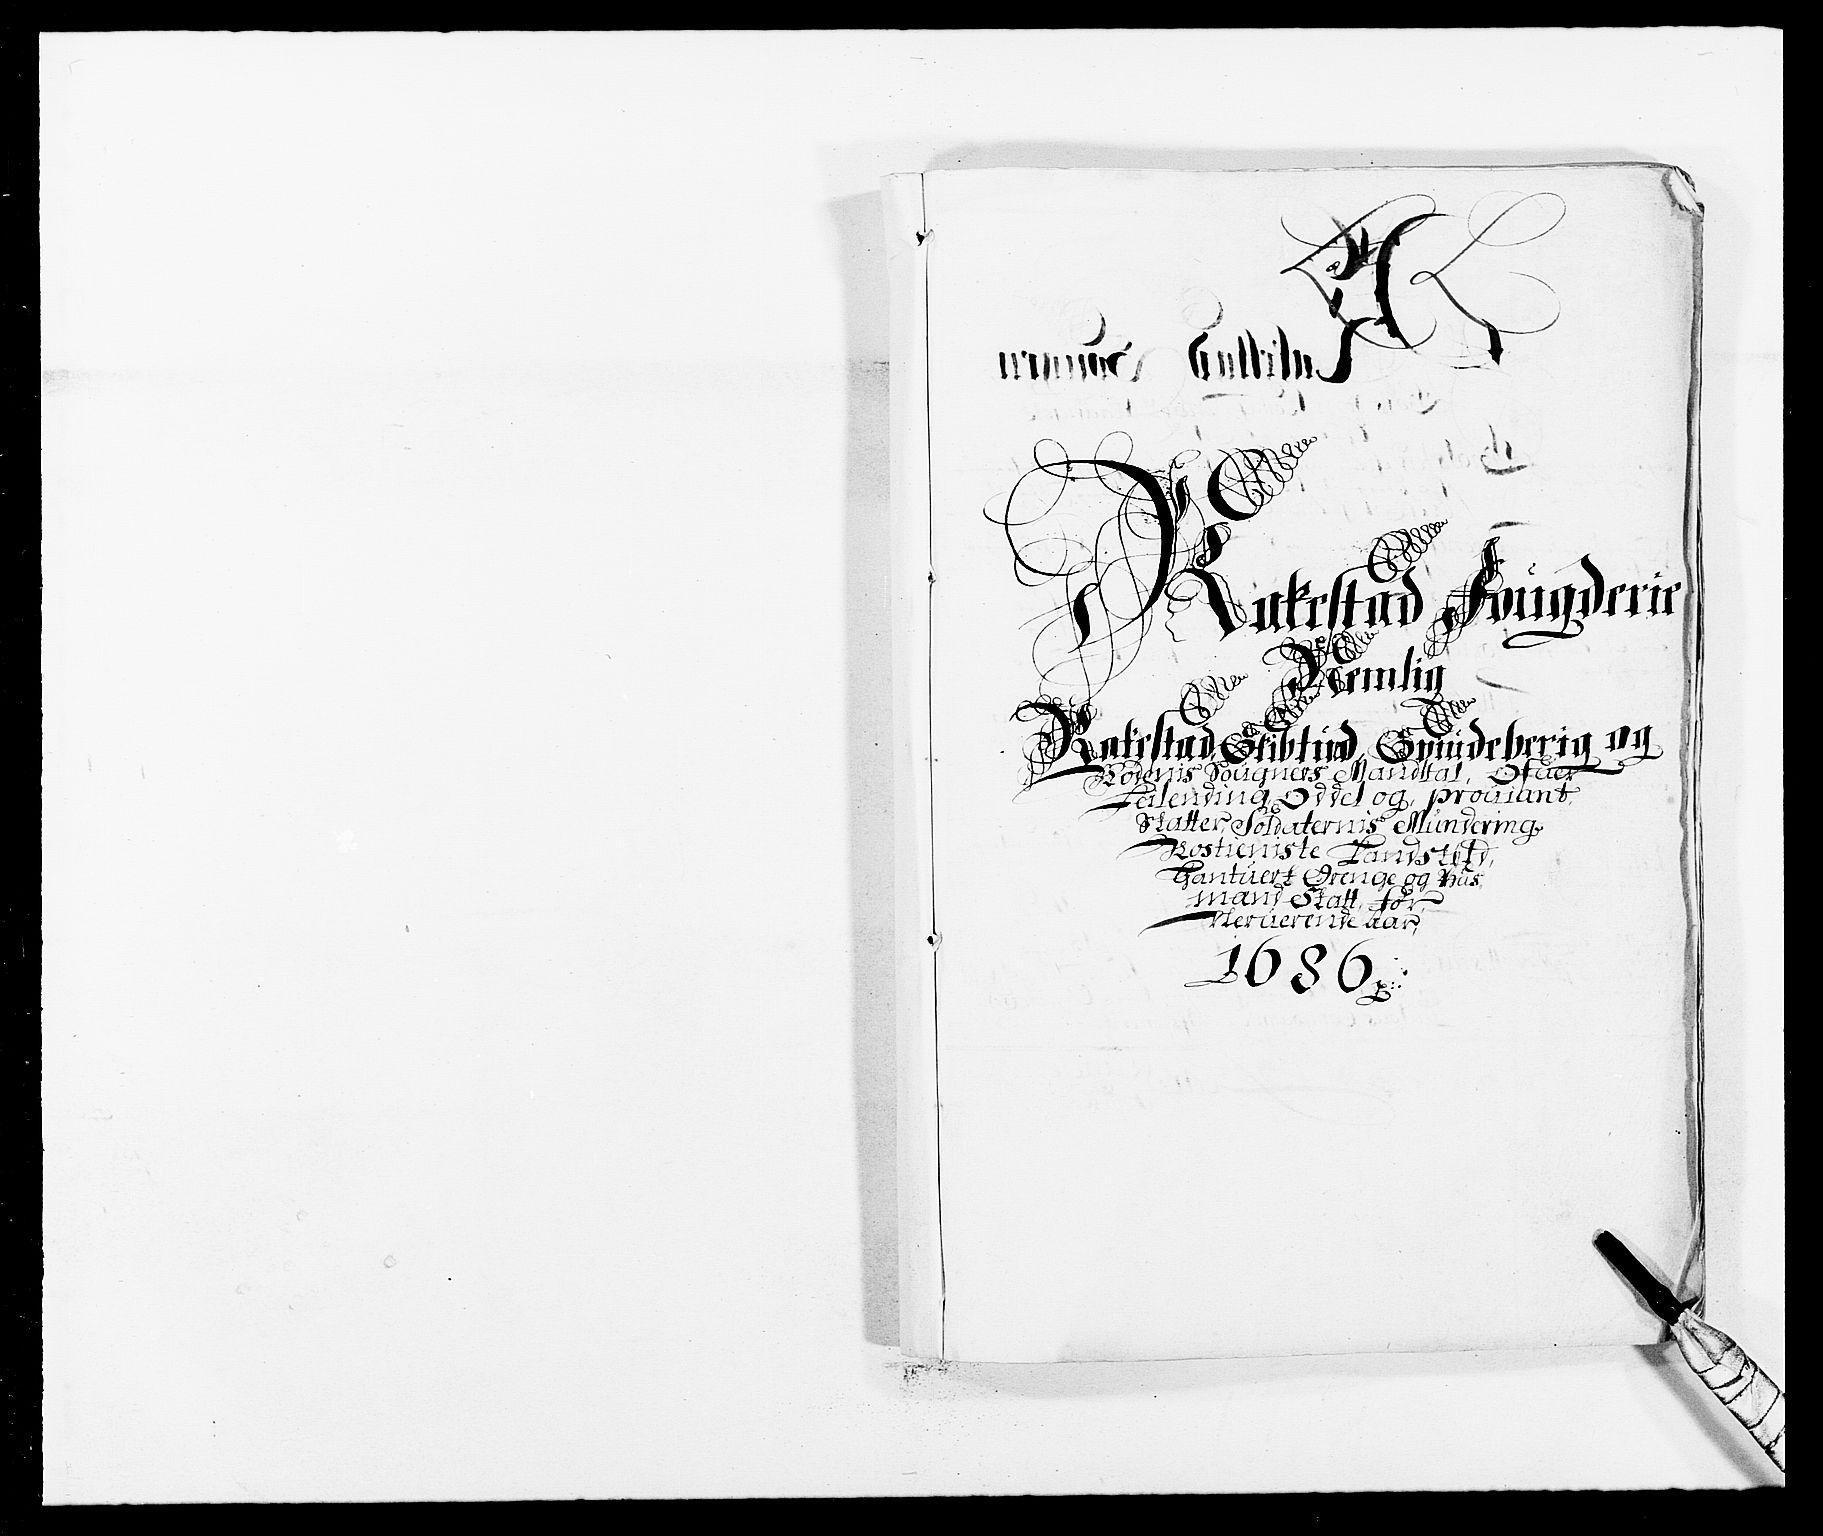 RA, Rentekammeret inntil 1814, Reviderte regnskaper, Fogderegnskap, R05/L0275: Fogderegnskap Rakkestad, 1685-1686, s. 191